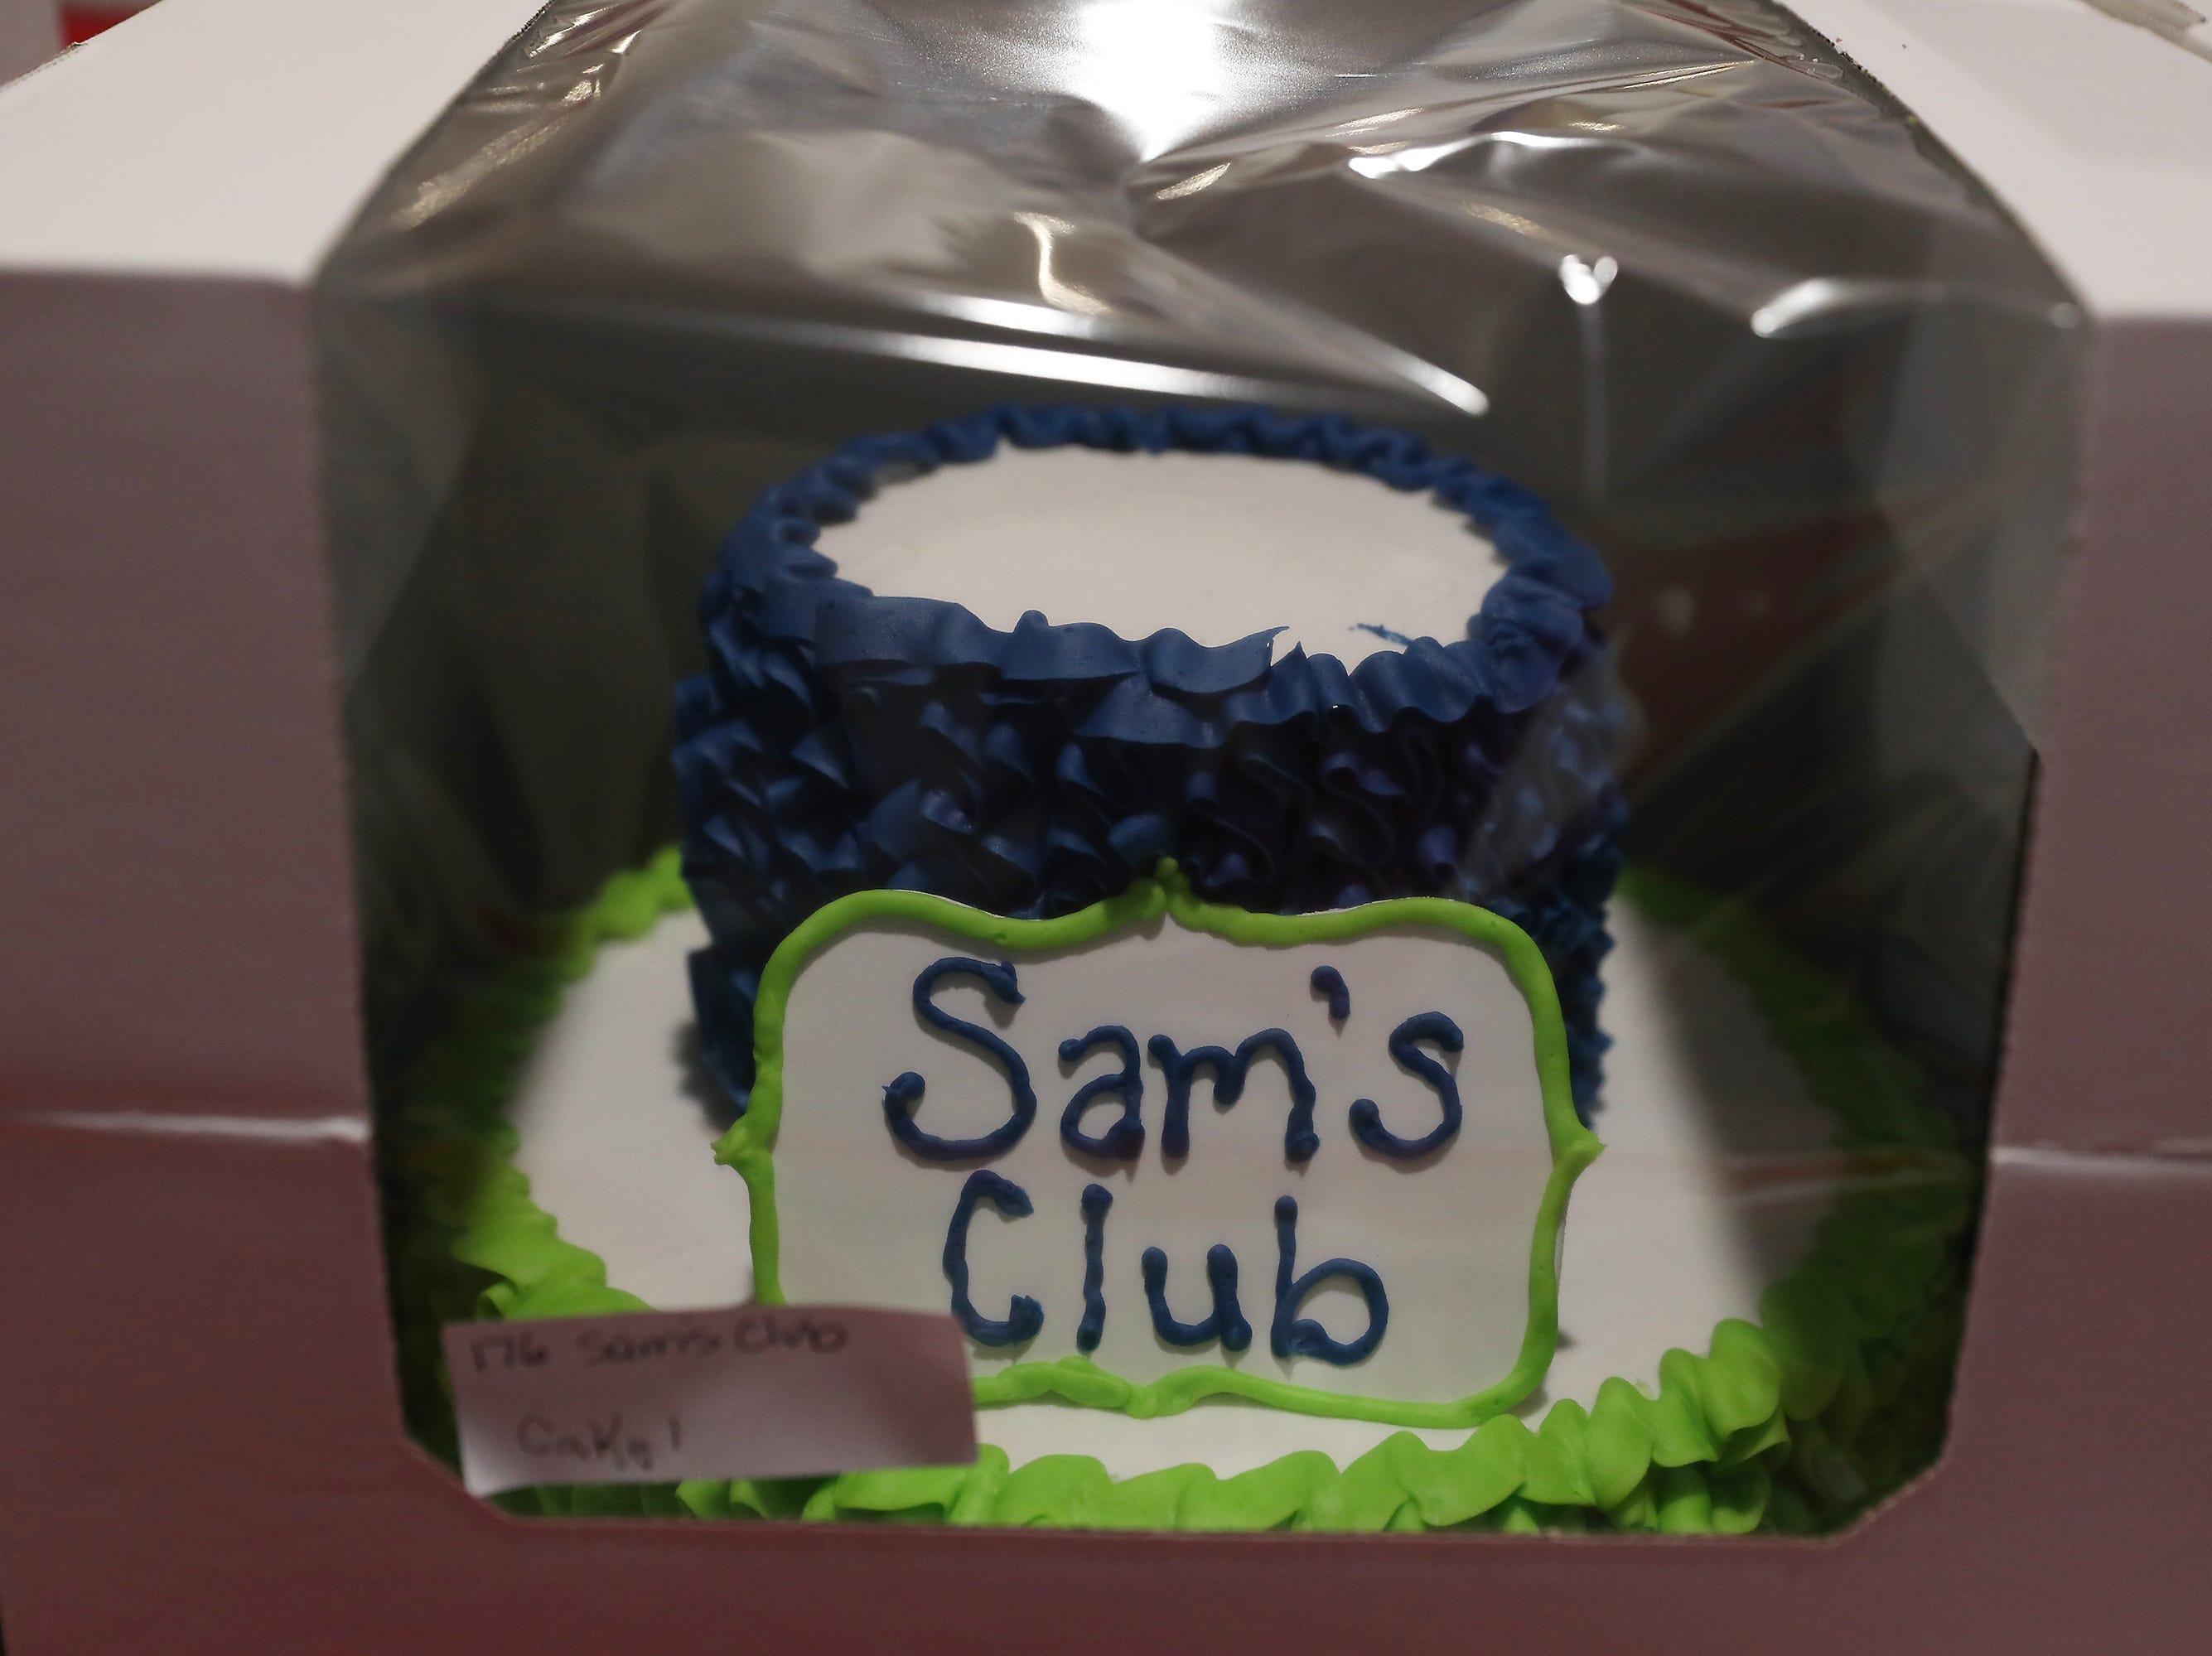 4:30 P.M. Thursday cake 176 Sam's Club - Mini Bike, gas powered, Coleman CT200U; $449 2 of 2 cakes.